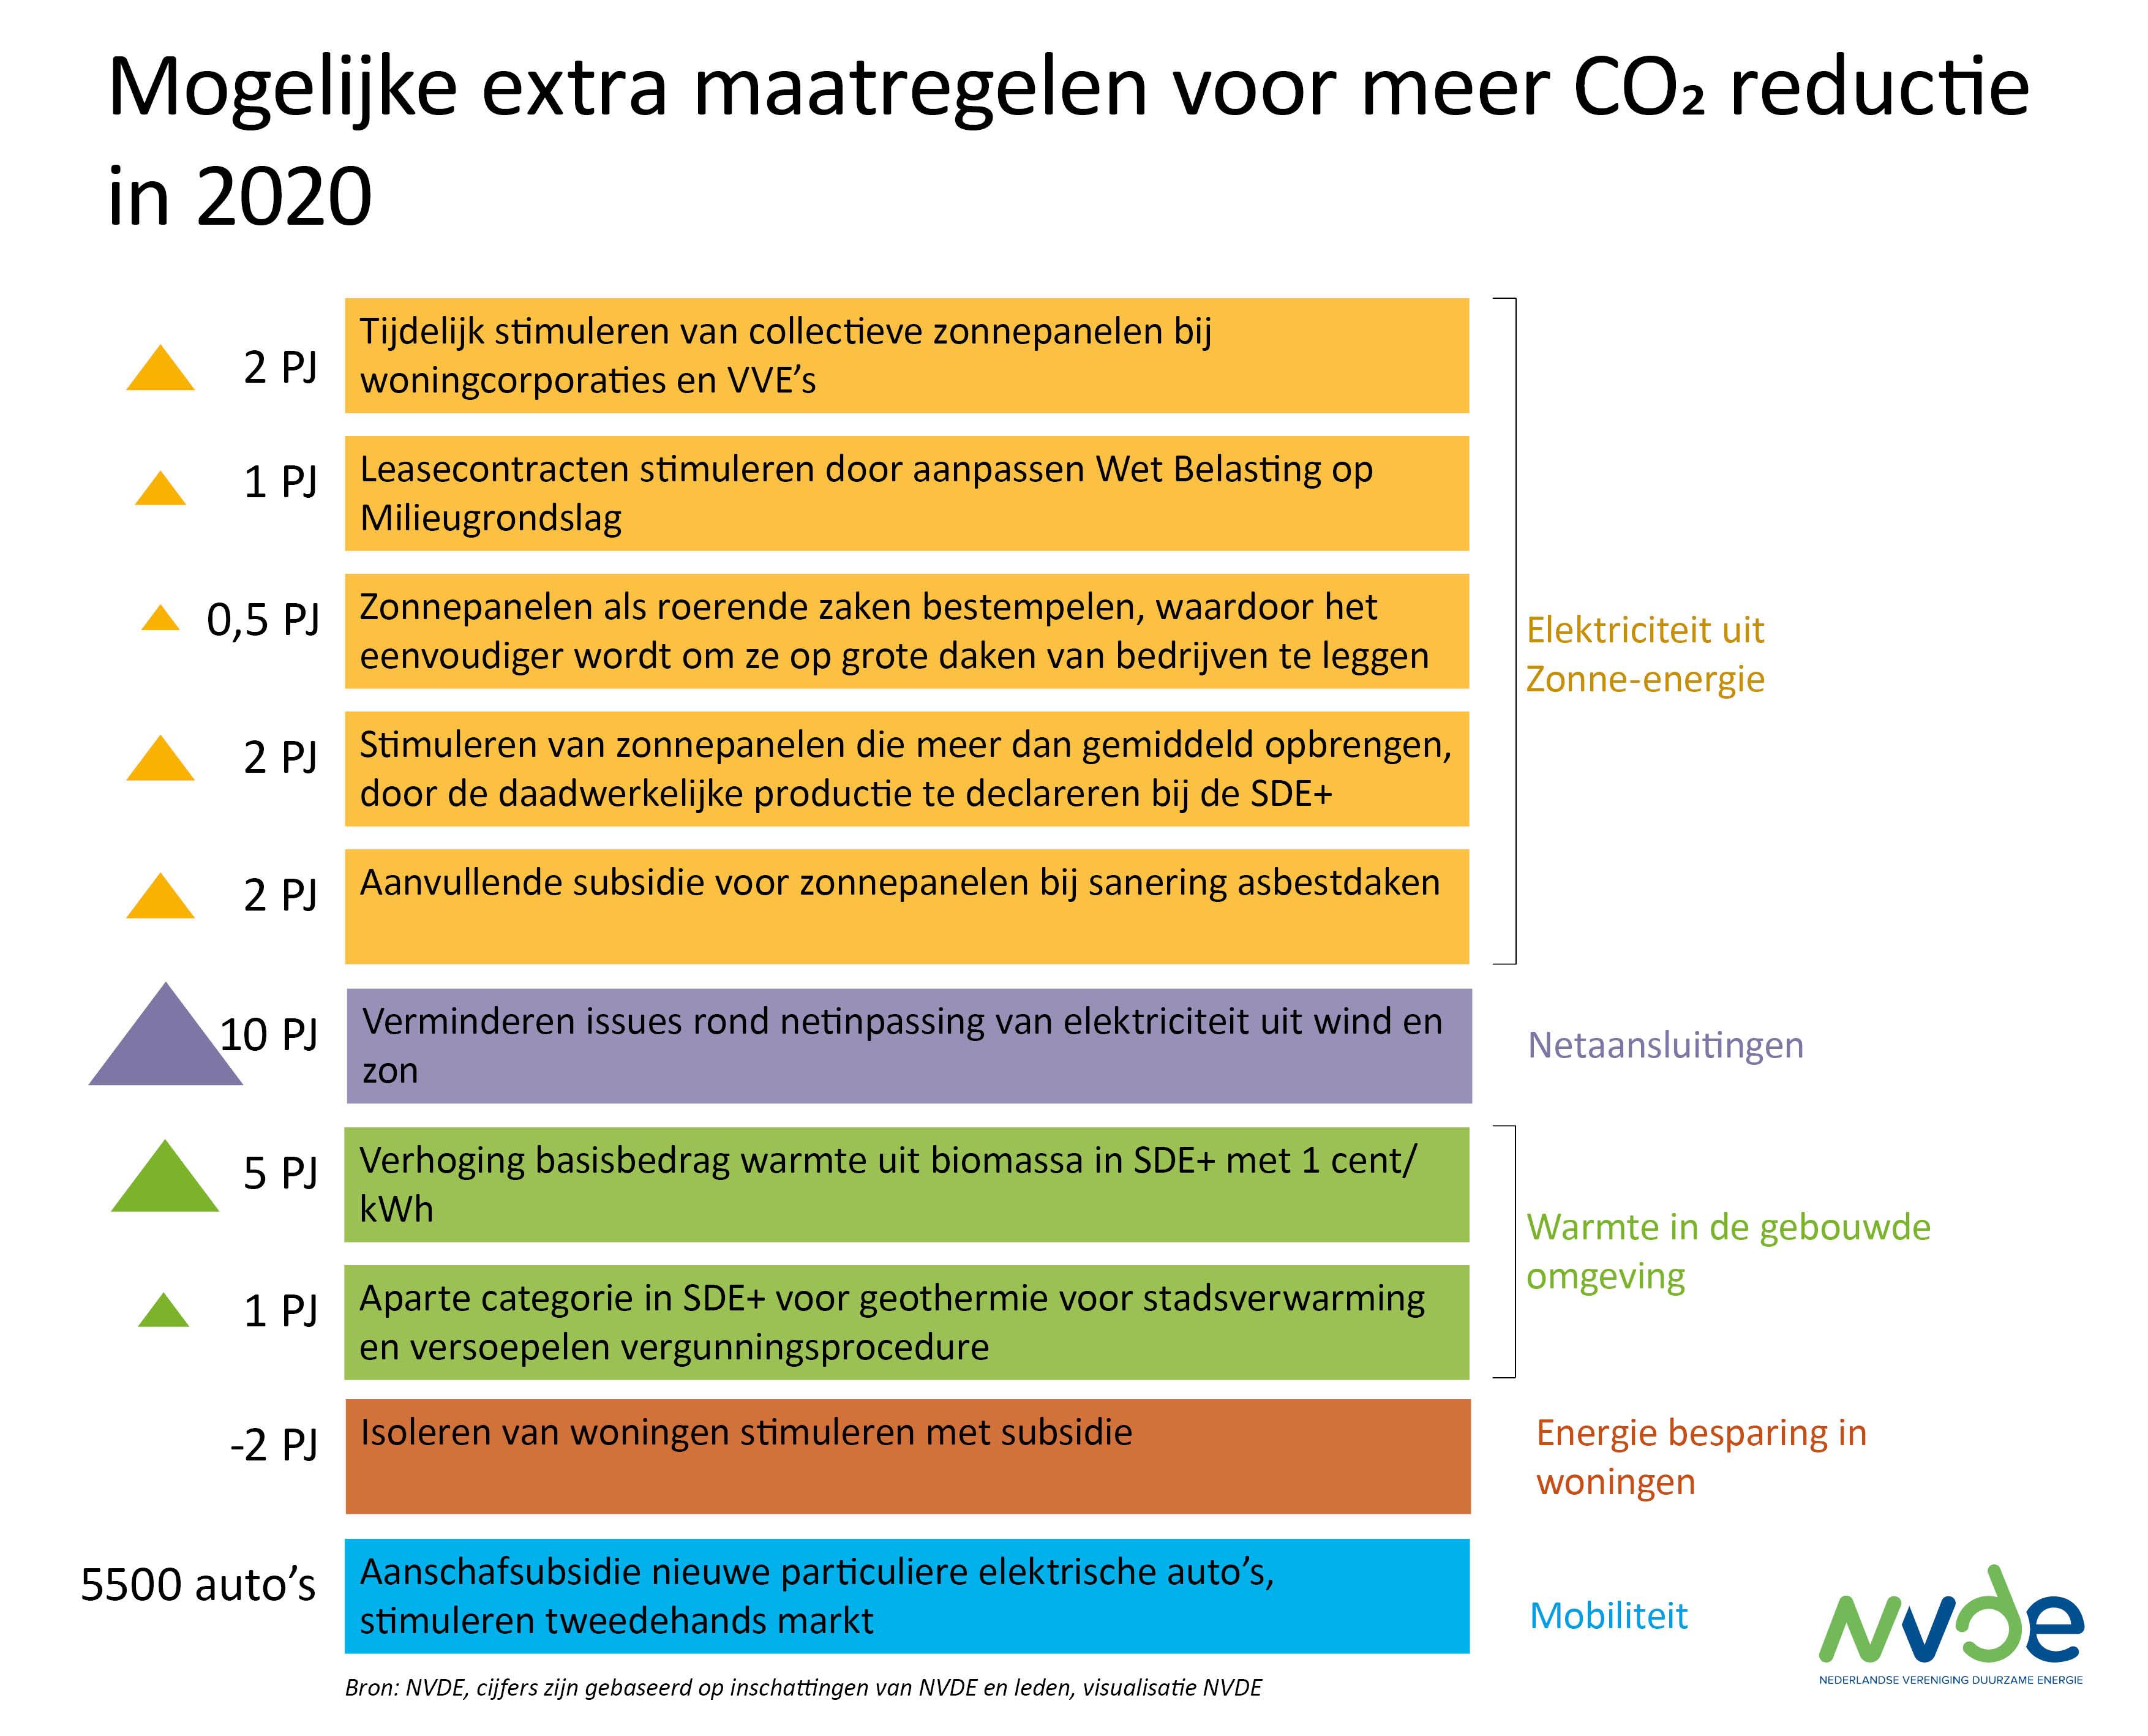 Homepage Nvde Nederlandse Vereniging Duurzame Energie